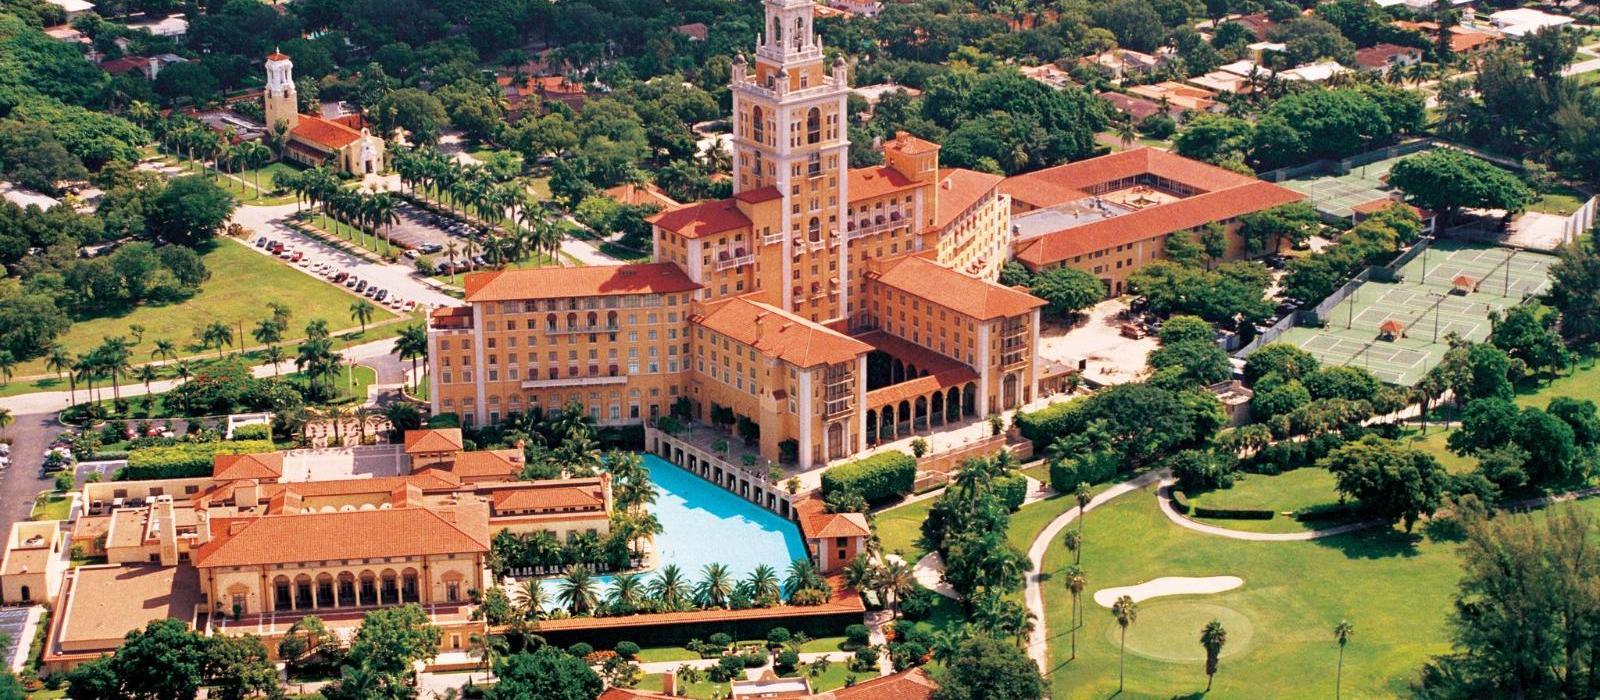 比特摩尔度假酒店(The Biltmore Miami Coral Gables) 图片  www.lhw.cn